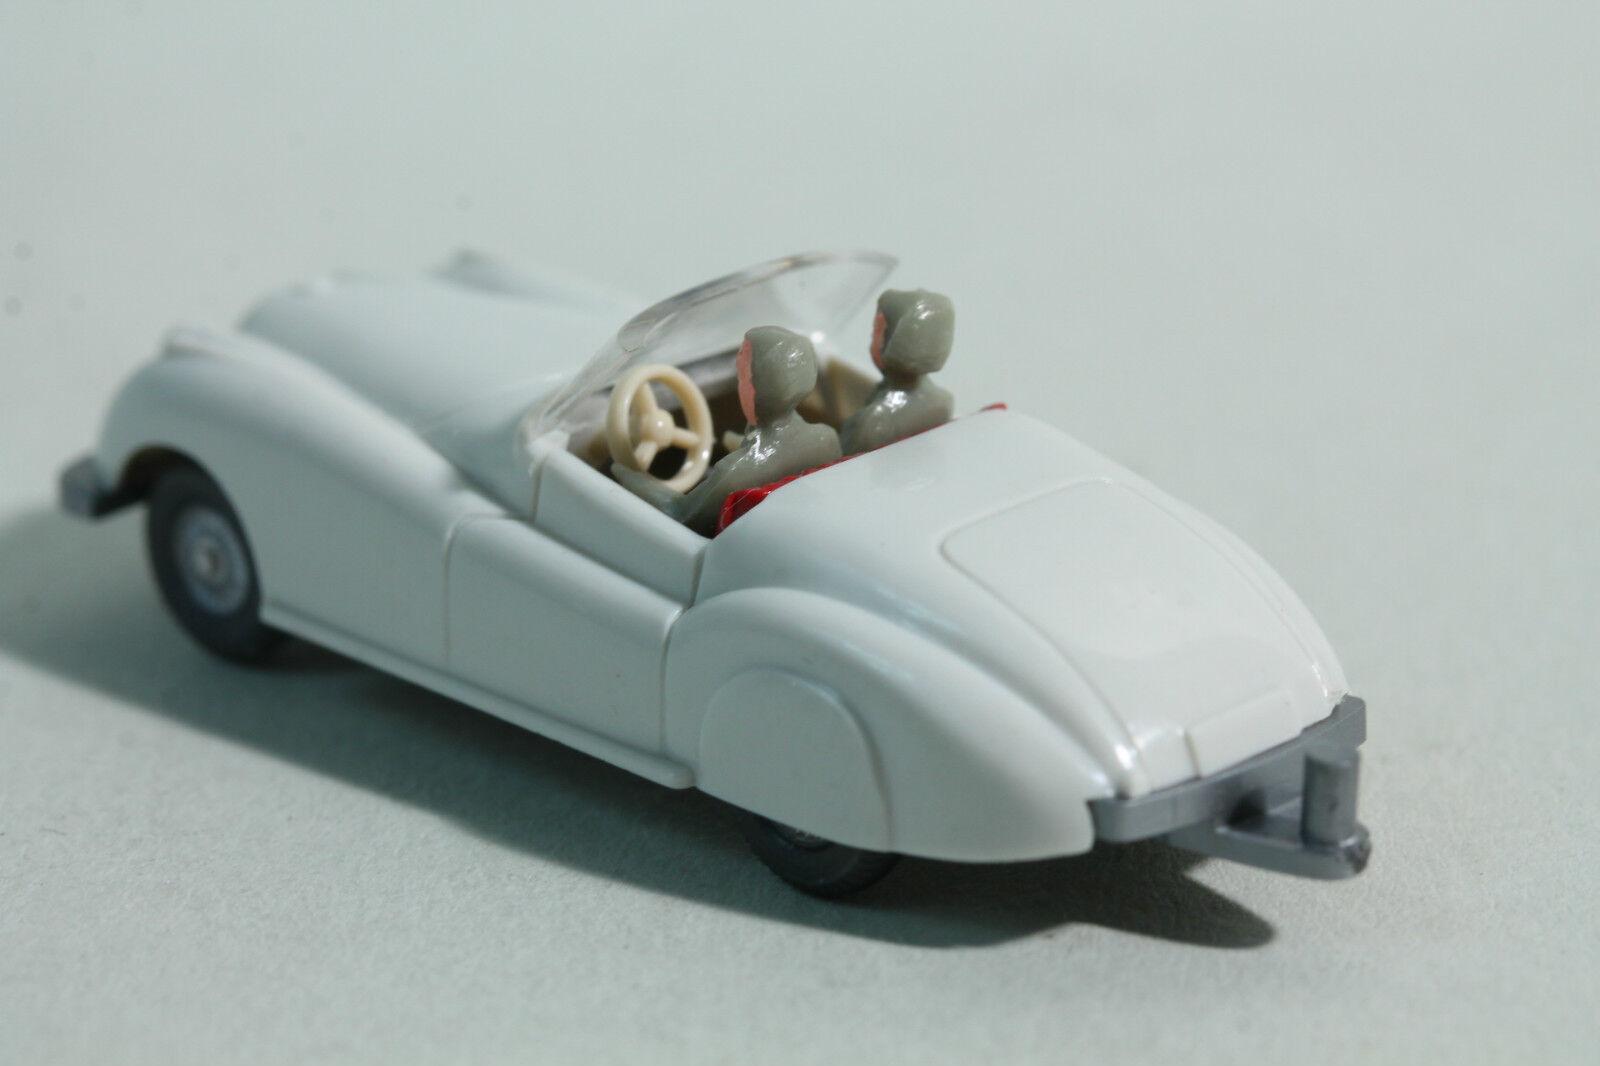 20 Typ 10E Wiking Jaguar Sport (Grill fein) Cabrio 1978 1978 1978 - 1987   cremeweiß  | Verrückte Preis  825d66